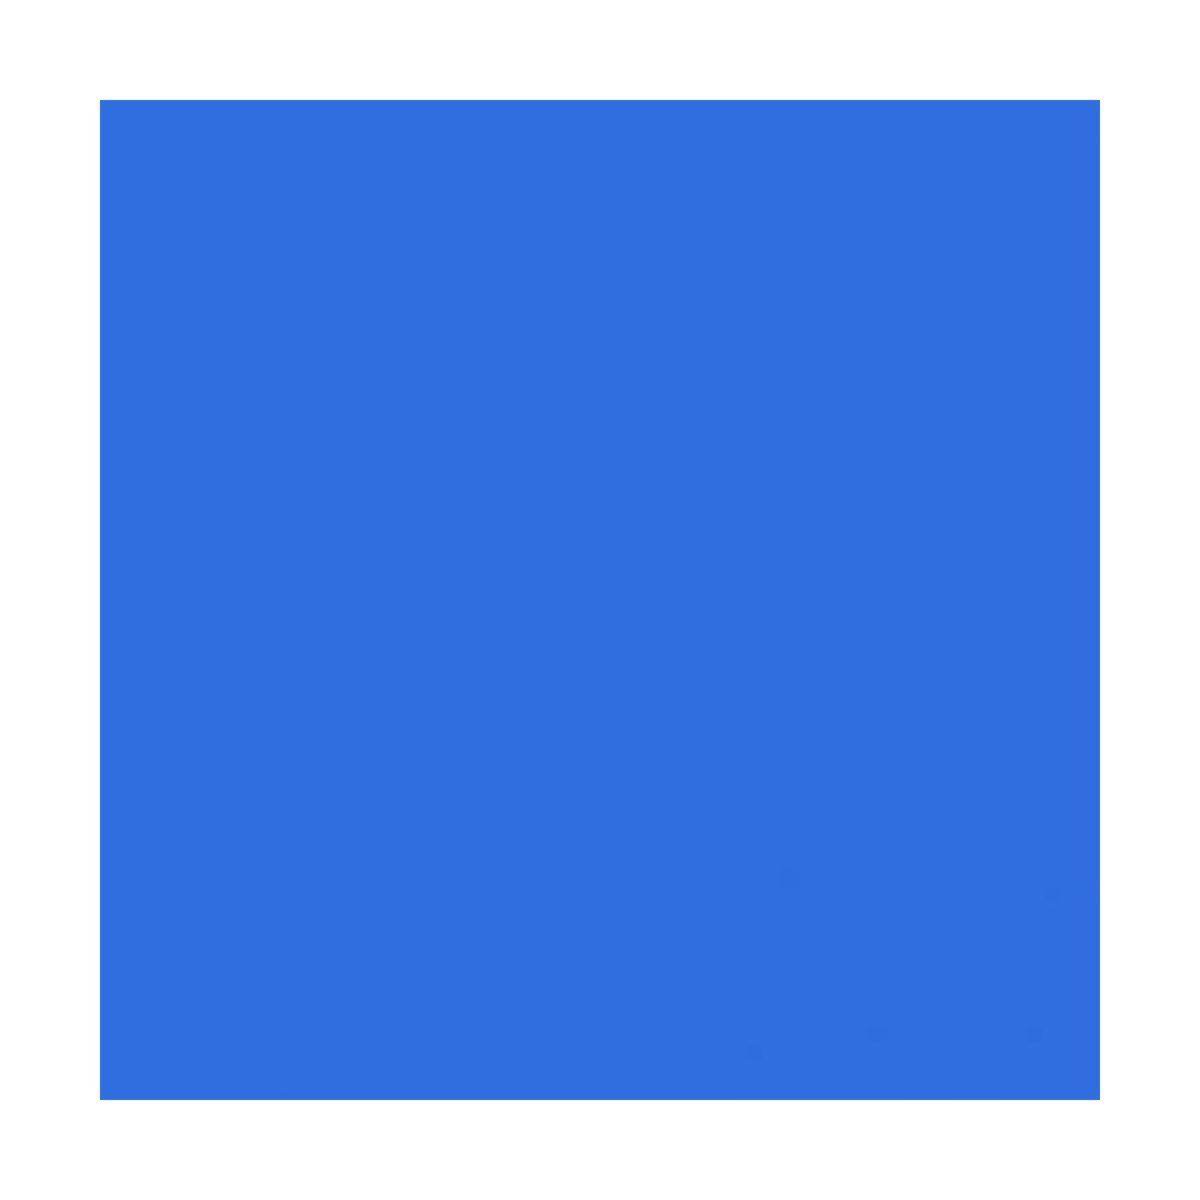 bd_backgrounds_136_foto_blue_02